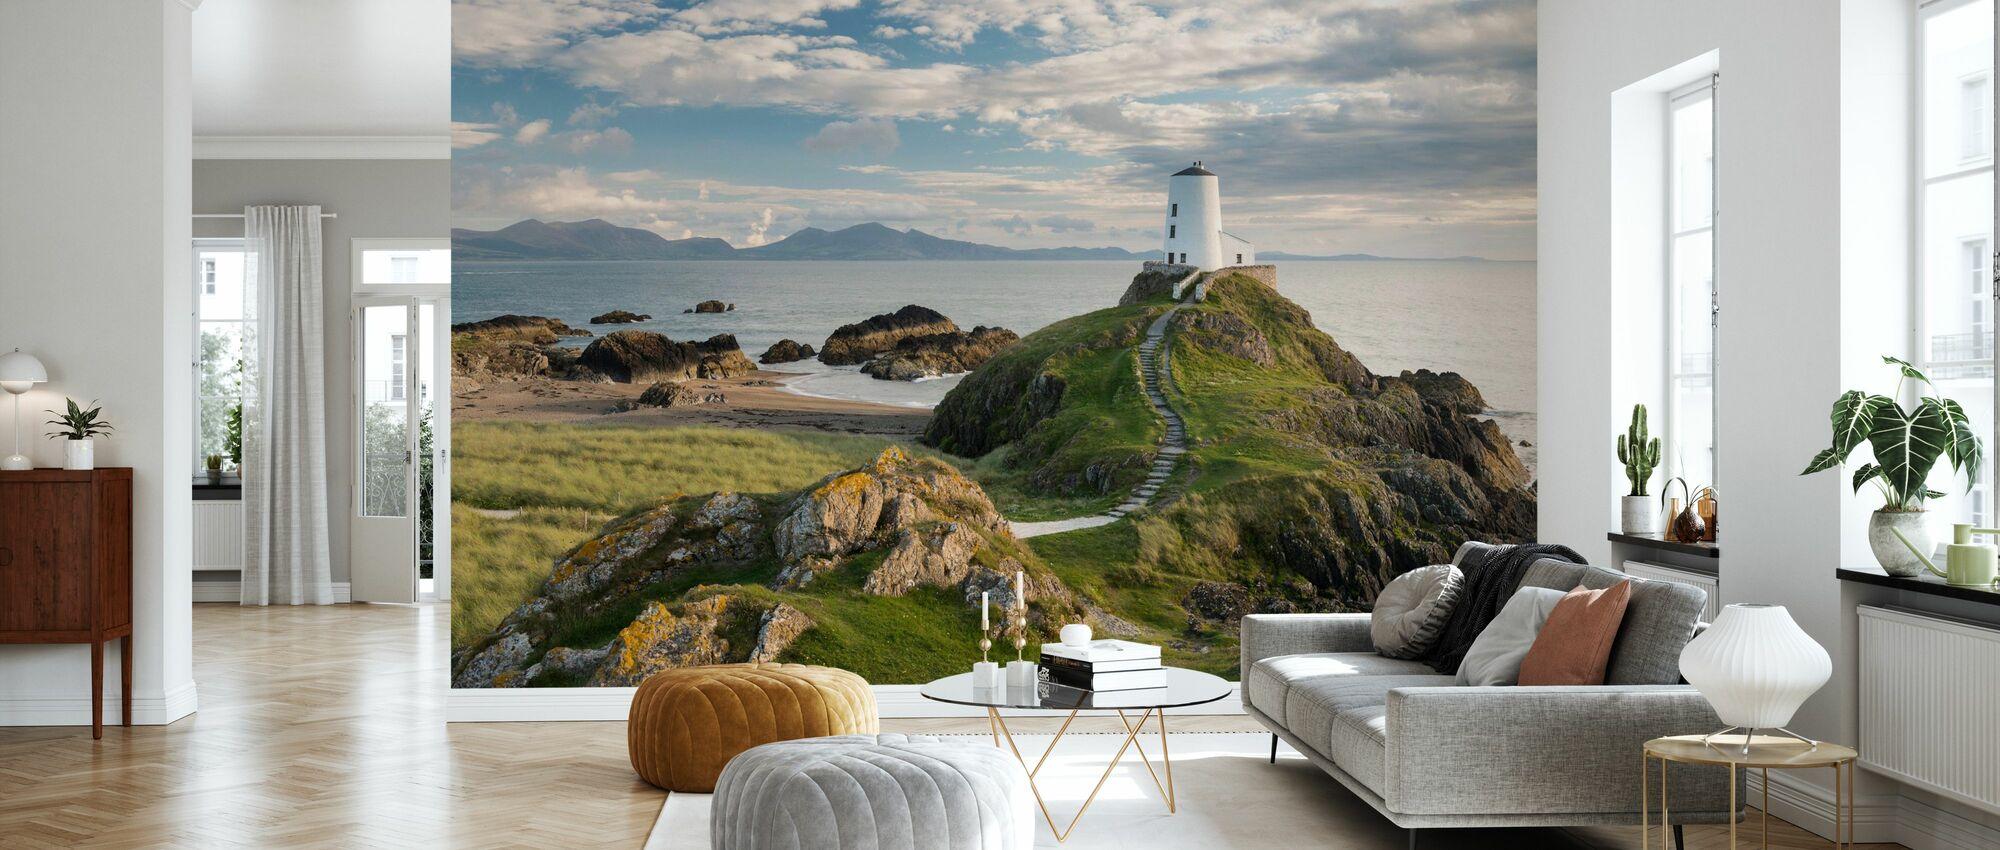 Llanddwyn Island Lighthouse - Wallpaper - Living Room